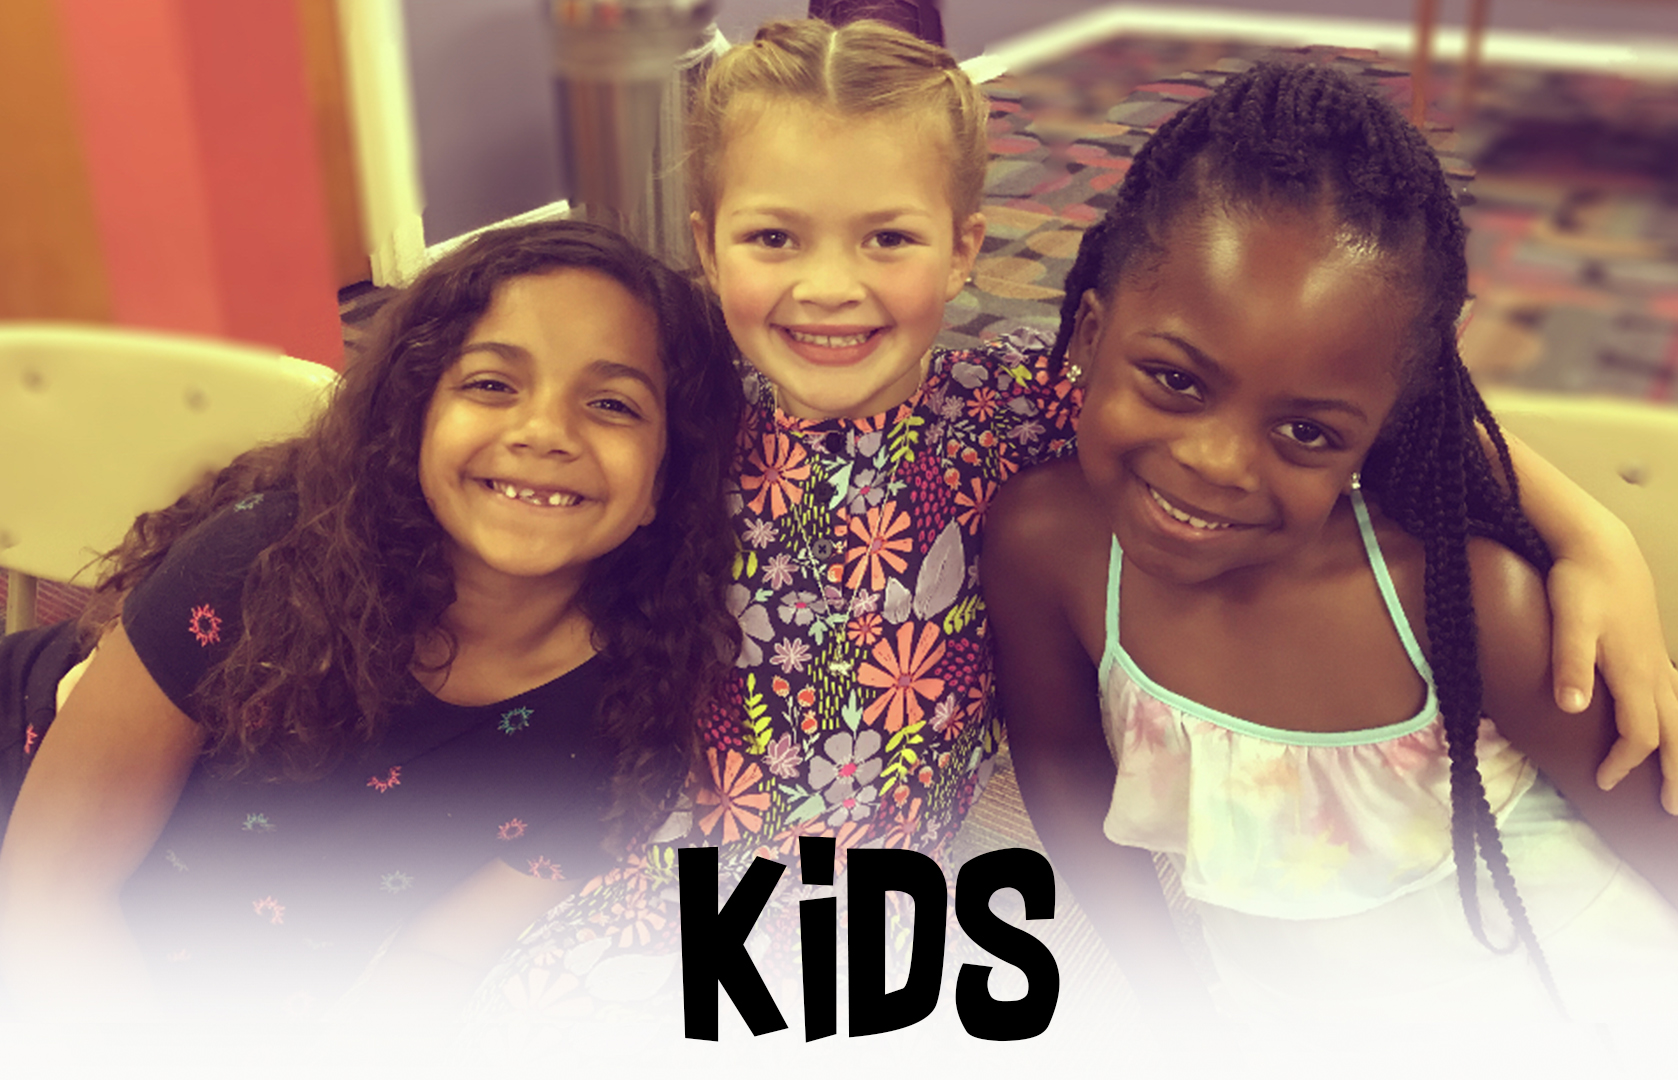 kids image3.jpg